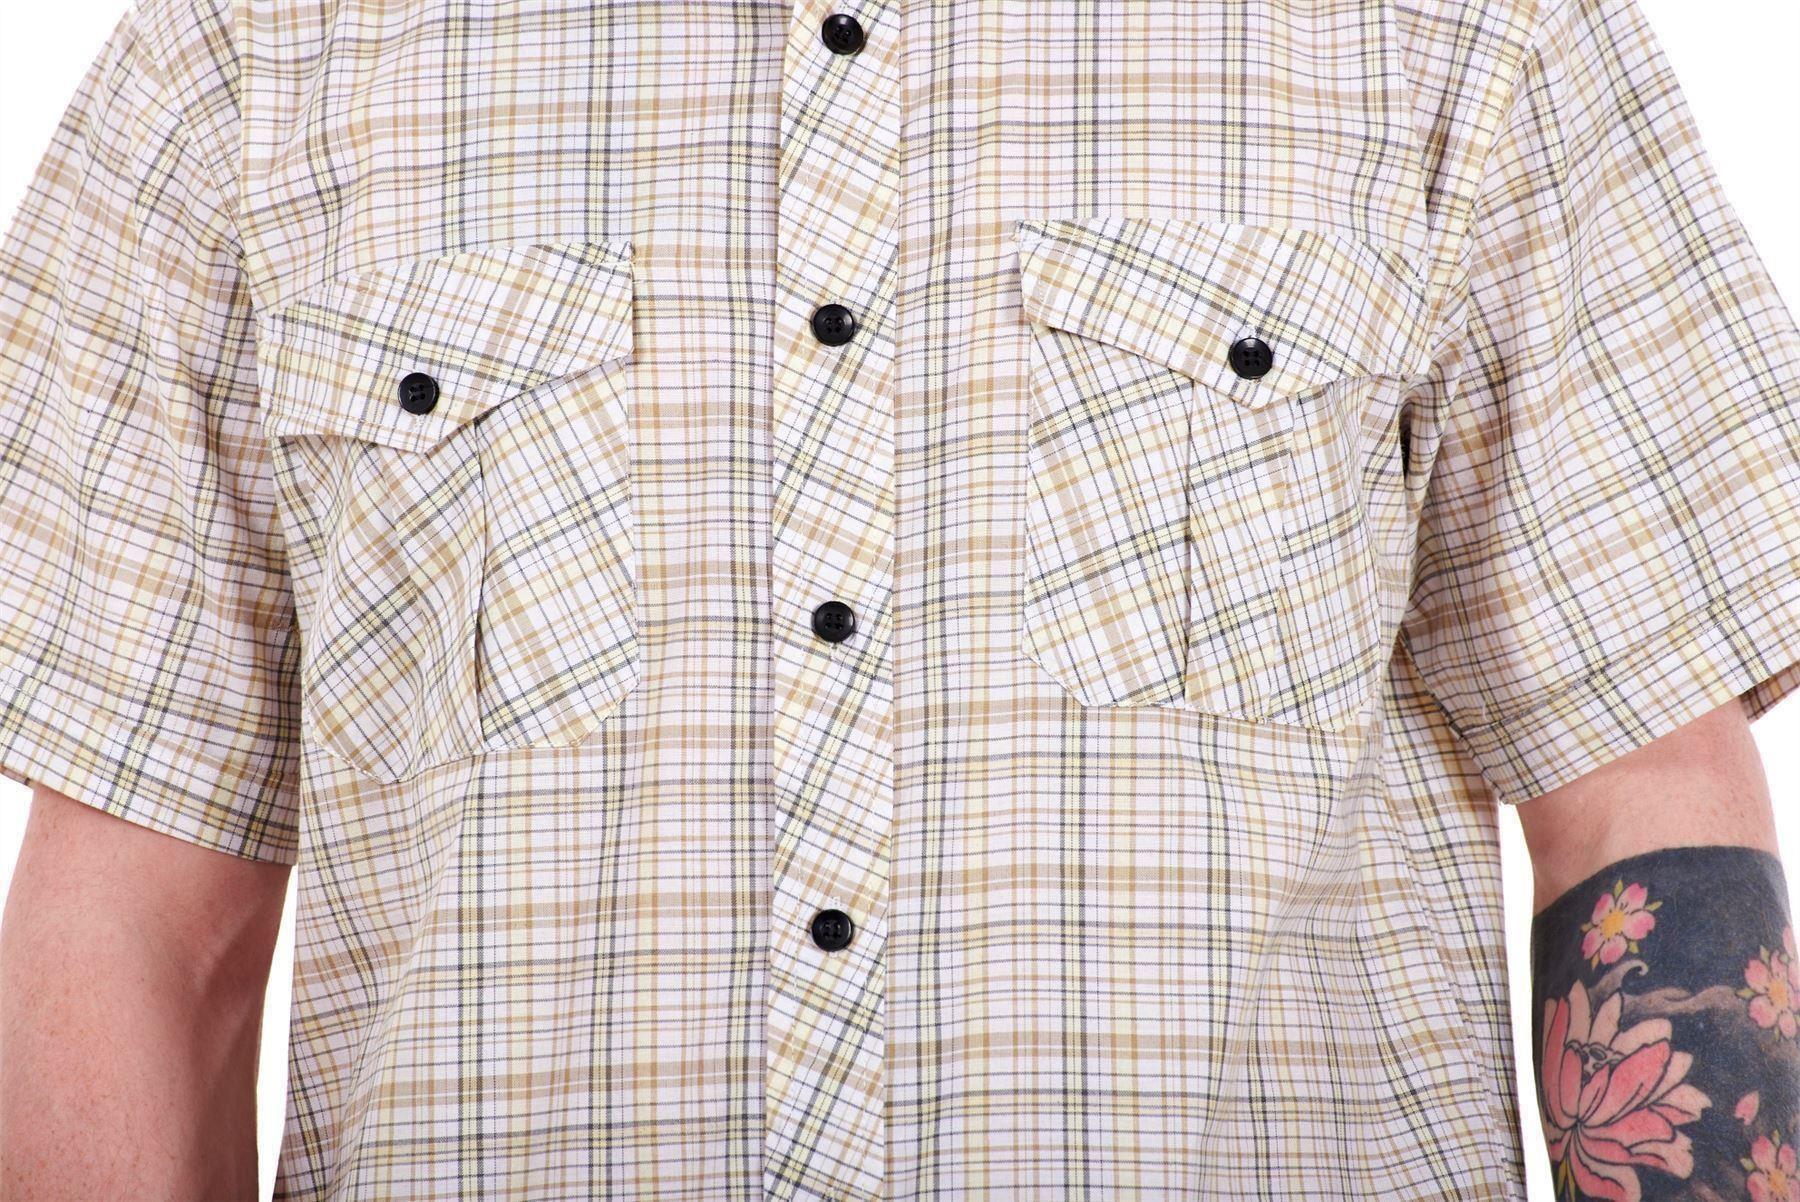 Mens-Regular-Big-Size-Shirts-Checked-Cotton-Blend-Casual-Short-Sleeve-M-to-5XL thumbnail 9